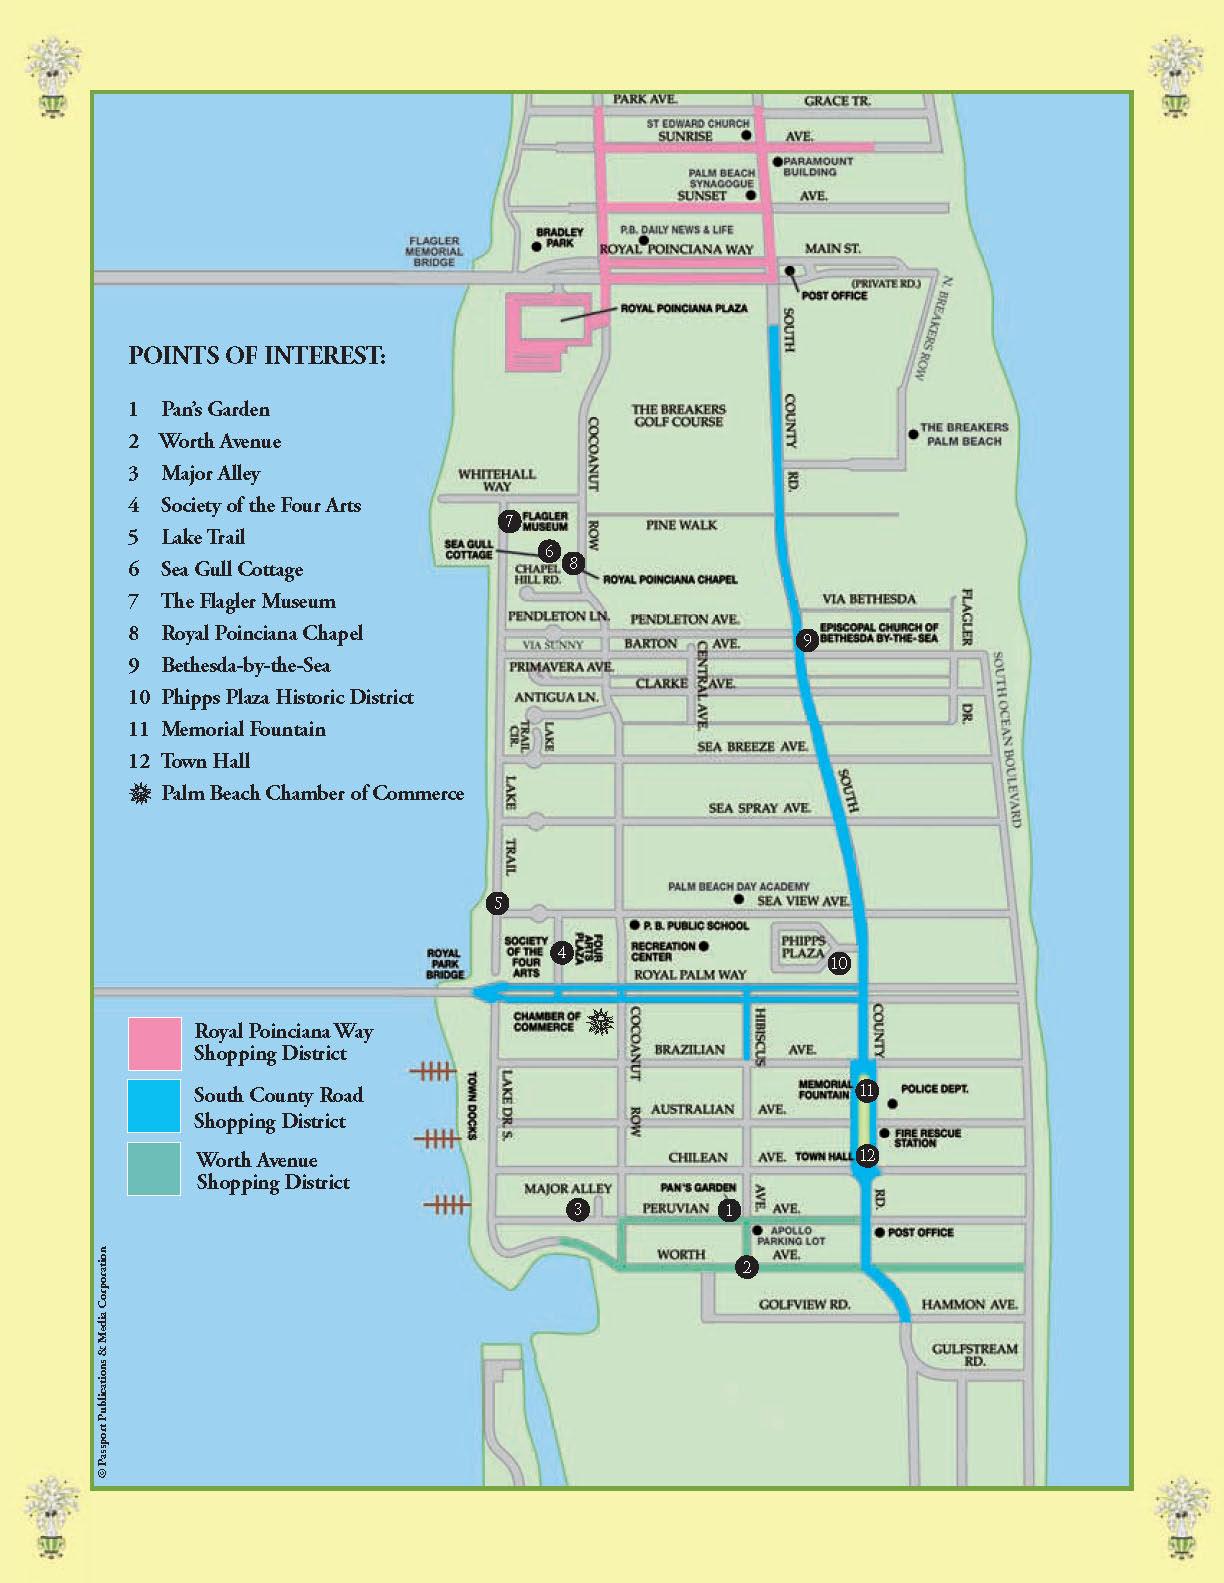 Map Of Palm Beach Florida.Palm Beach Tourist Map Palm Beach Mappery